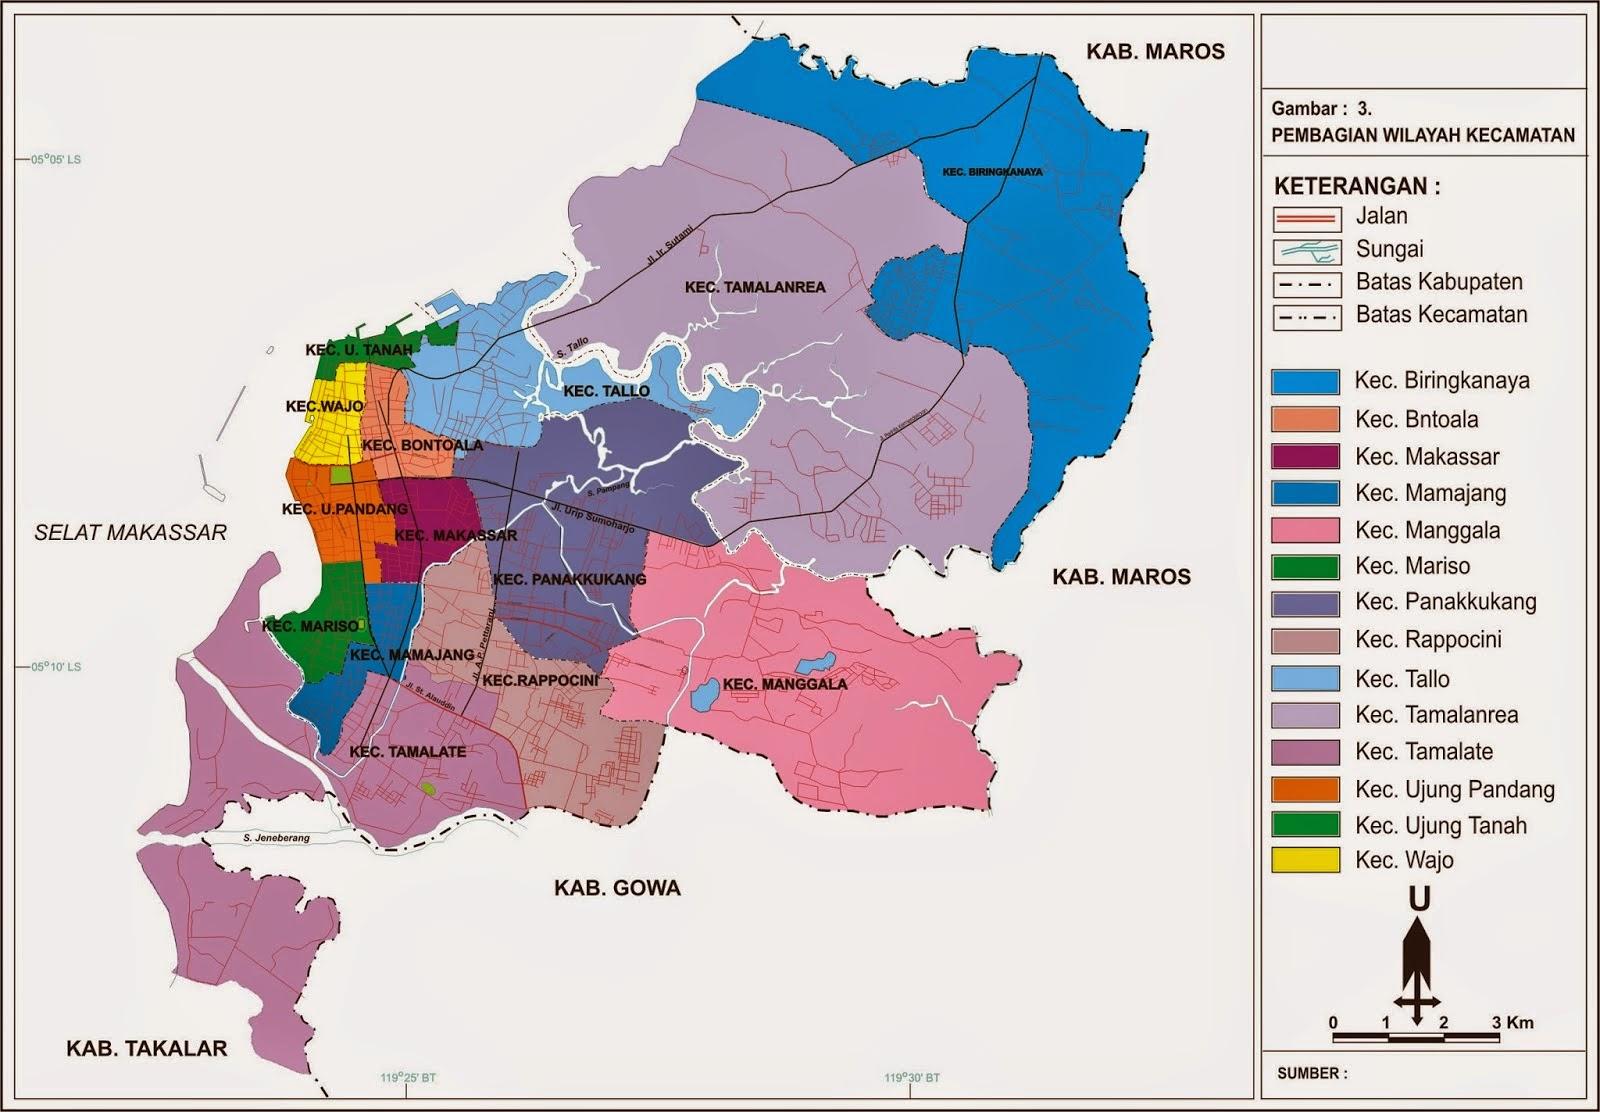 RIMNIT: Peta Makassar